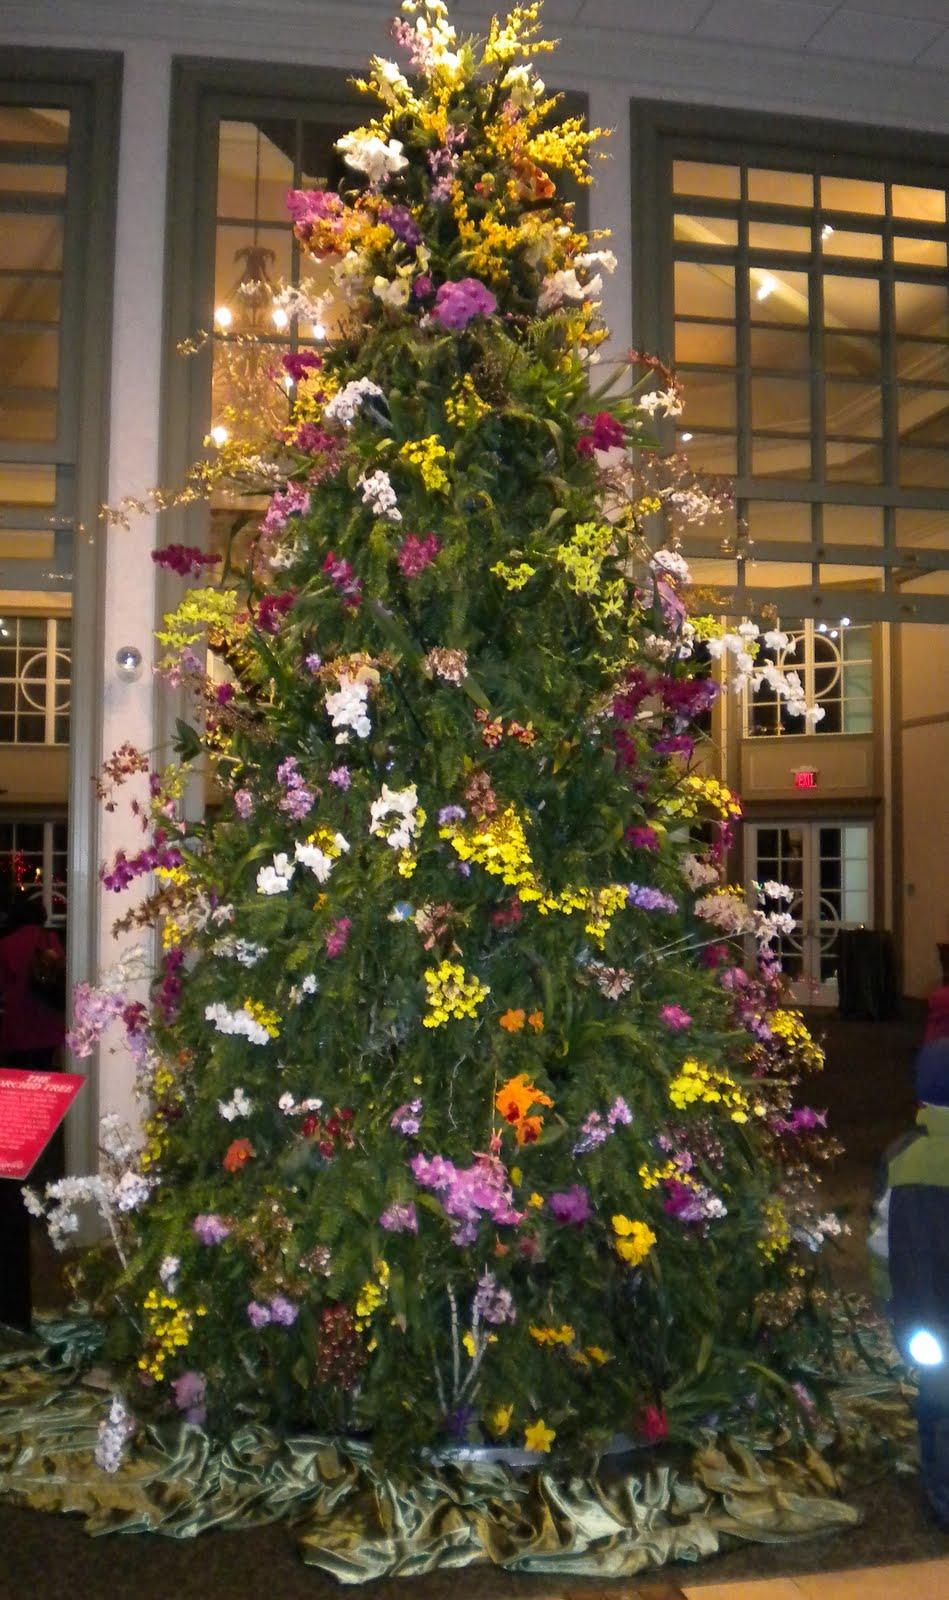 Orchid Christmas Tree.Sherri S Jubilee Daniel Stowe Botanical Garden With